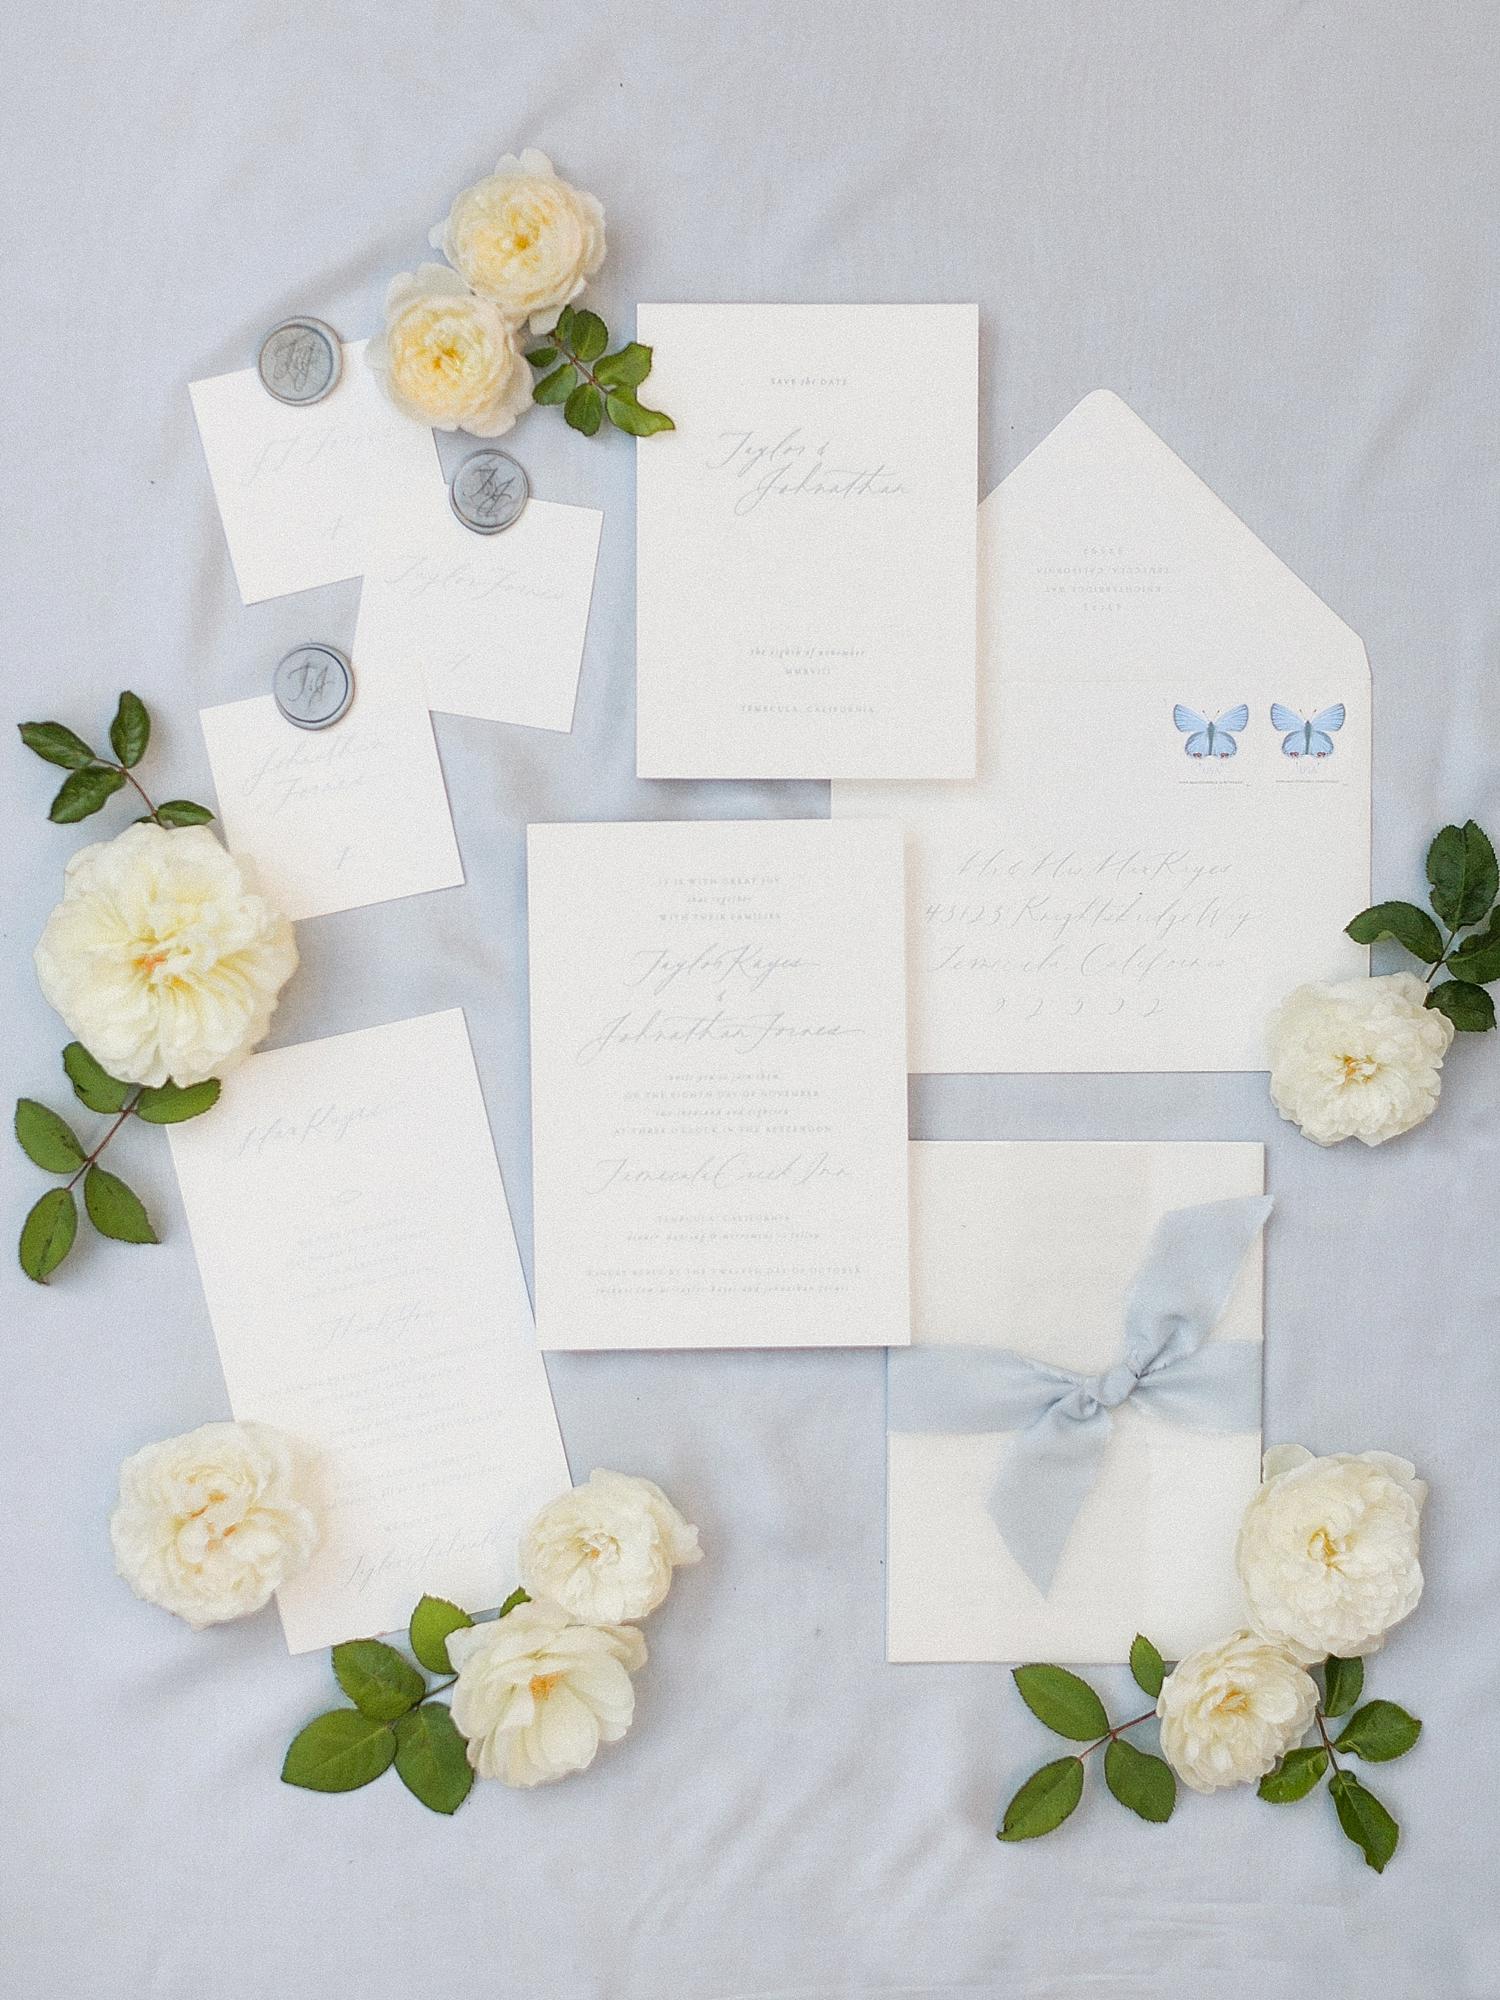 carla-kayes-floral-design_1060.jpg